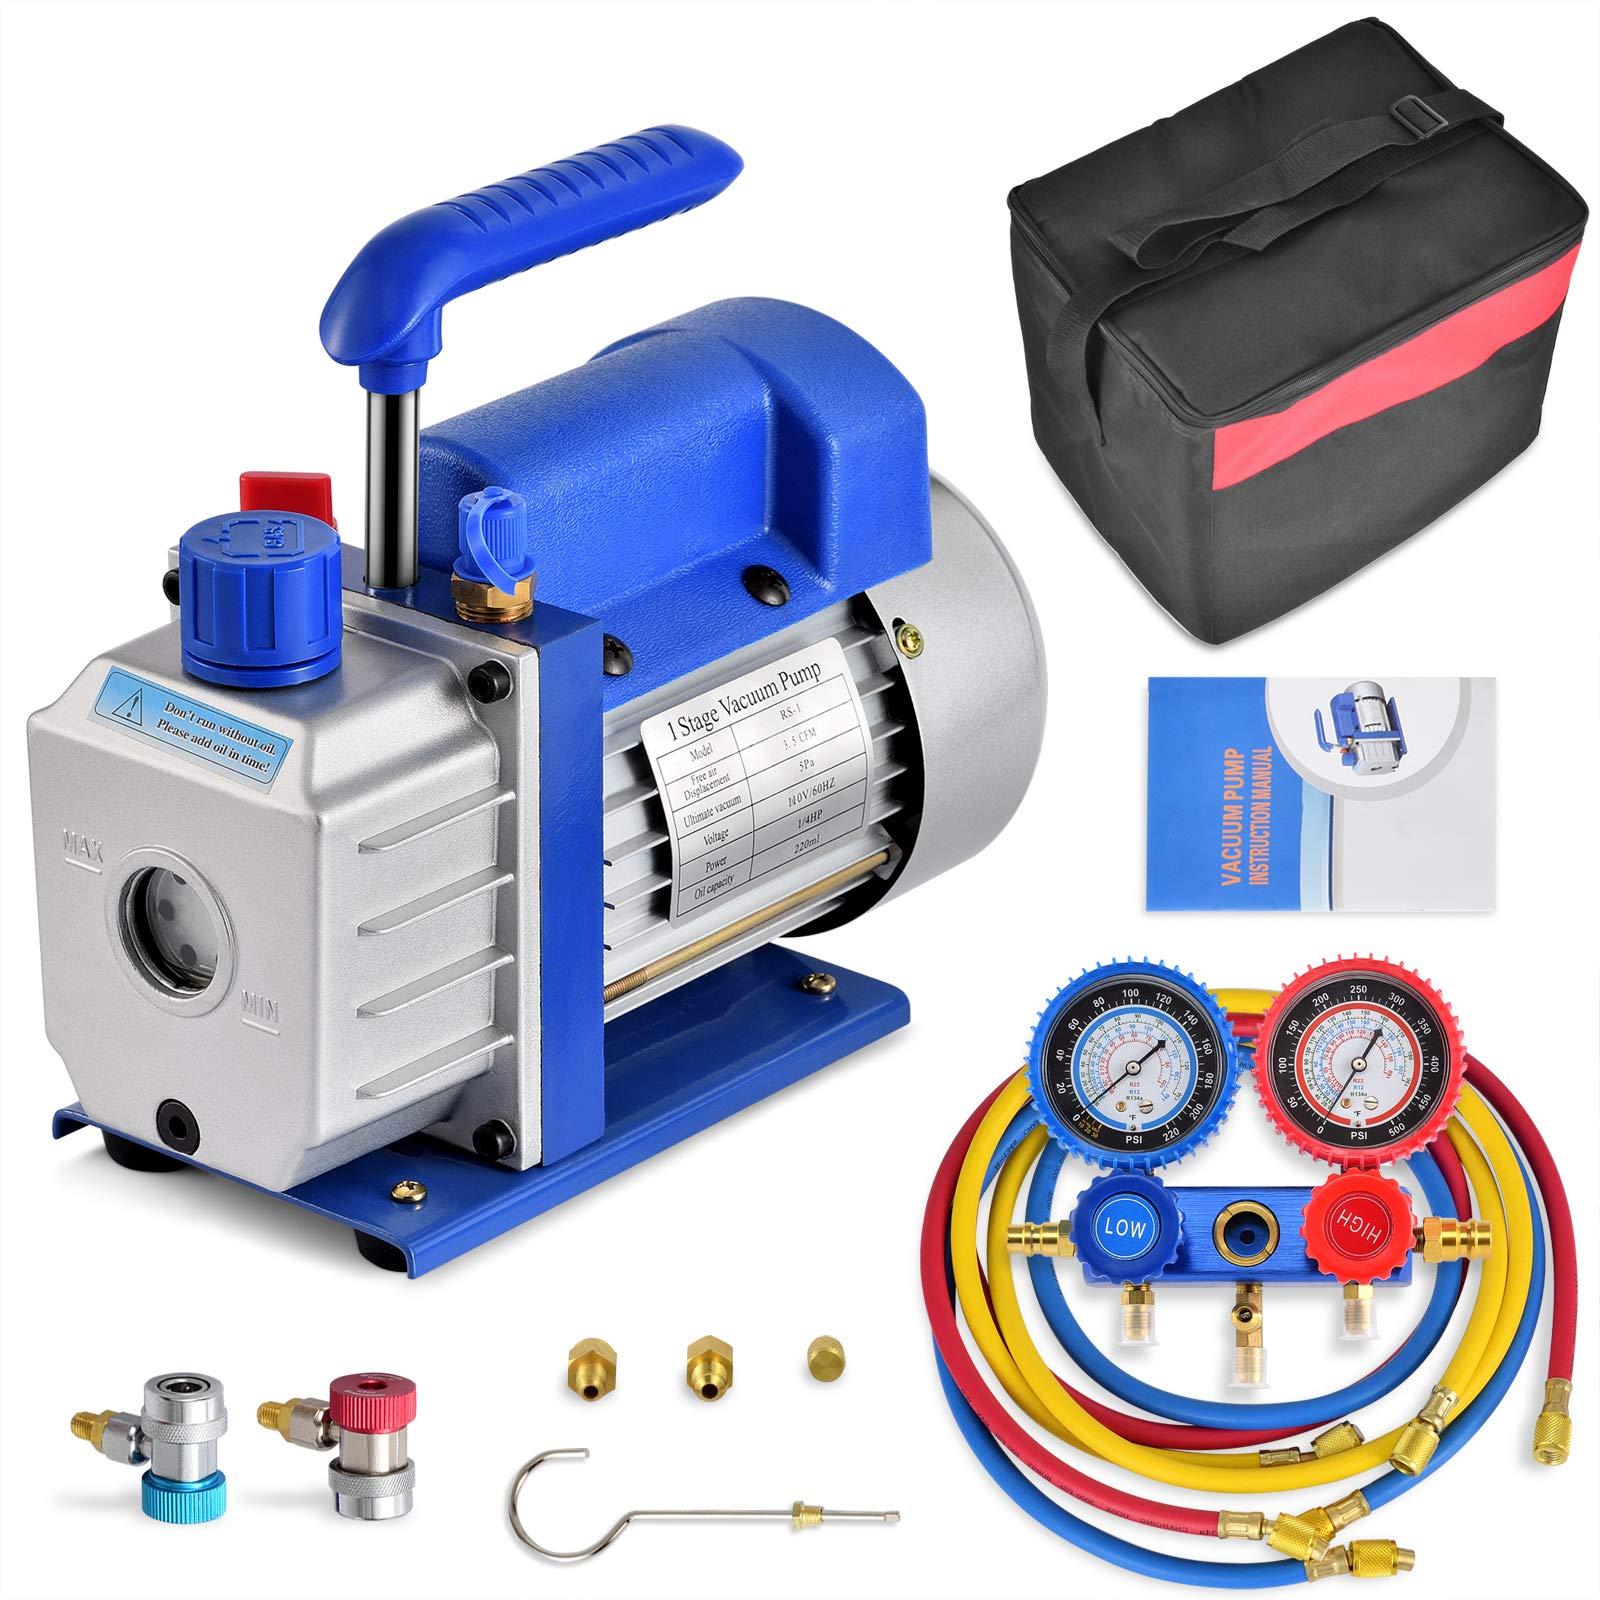 3.5CFM 1/4HP Air Vacuum Pump HVAC A/C Refrigeration Kit AC Manifold Gauge Set w/Leak Detector, 1/4HP Air Conditioner Refrigerant HVAC Air Tool